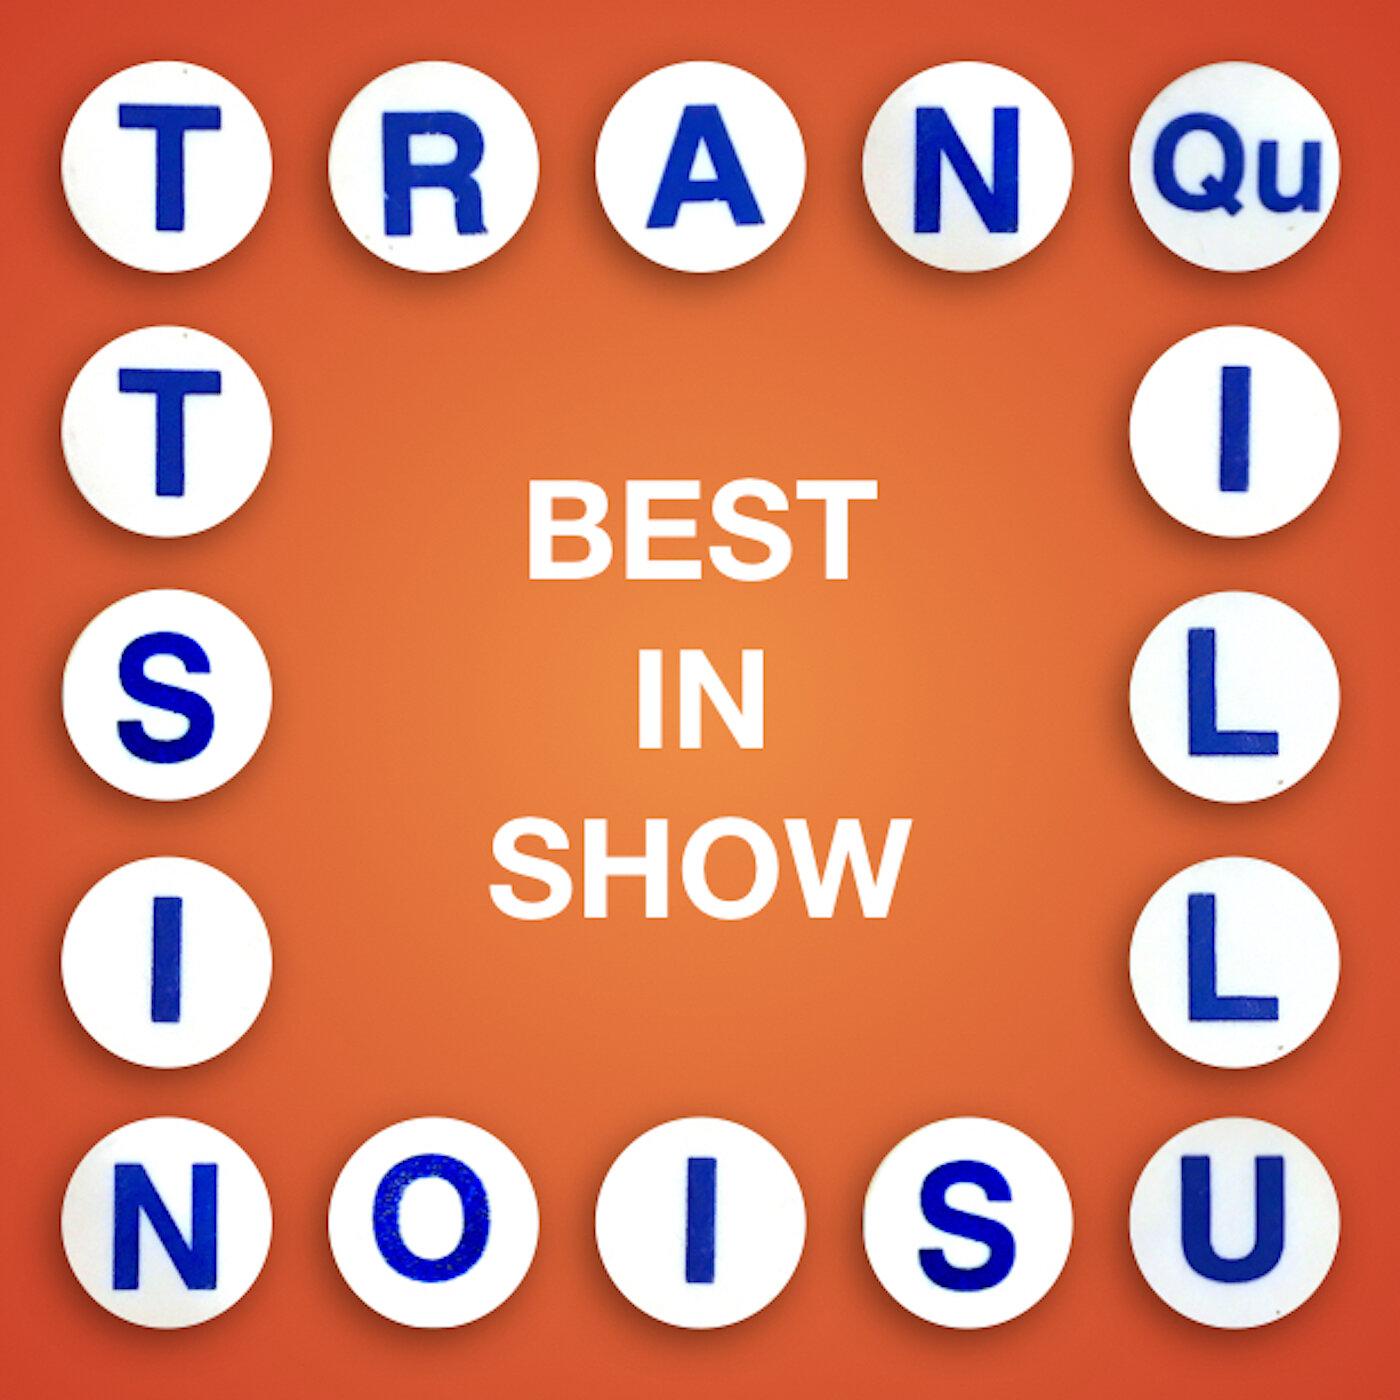 Tranquillusionist: Best In Show